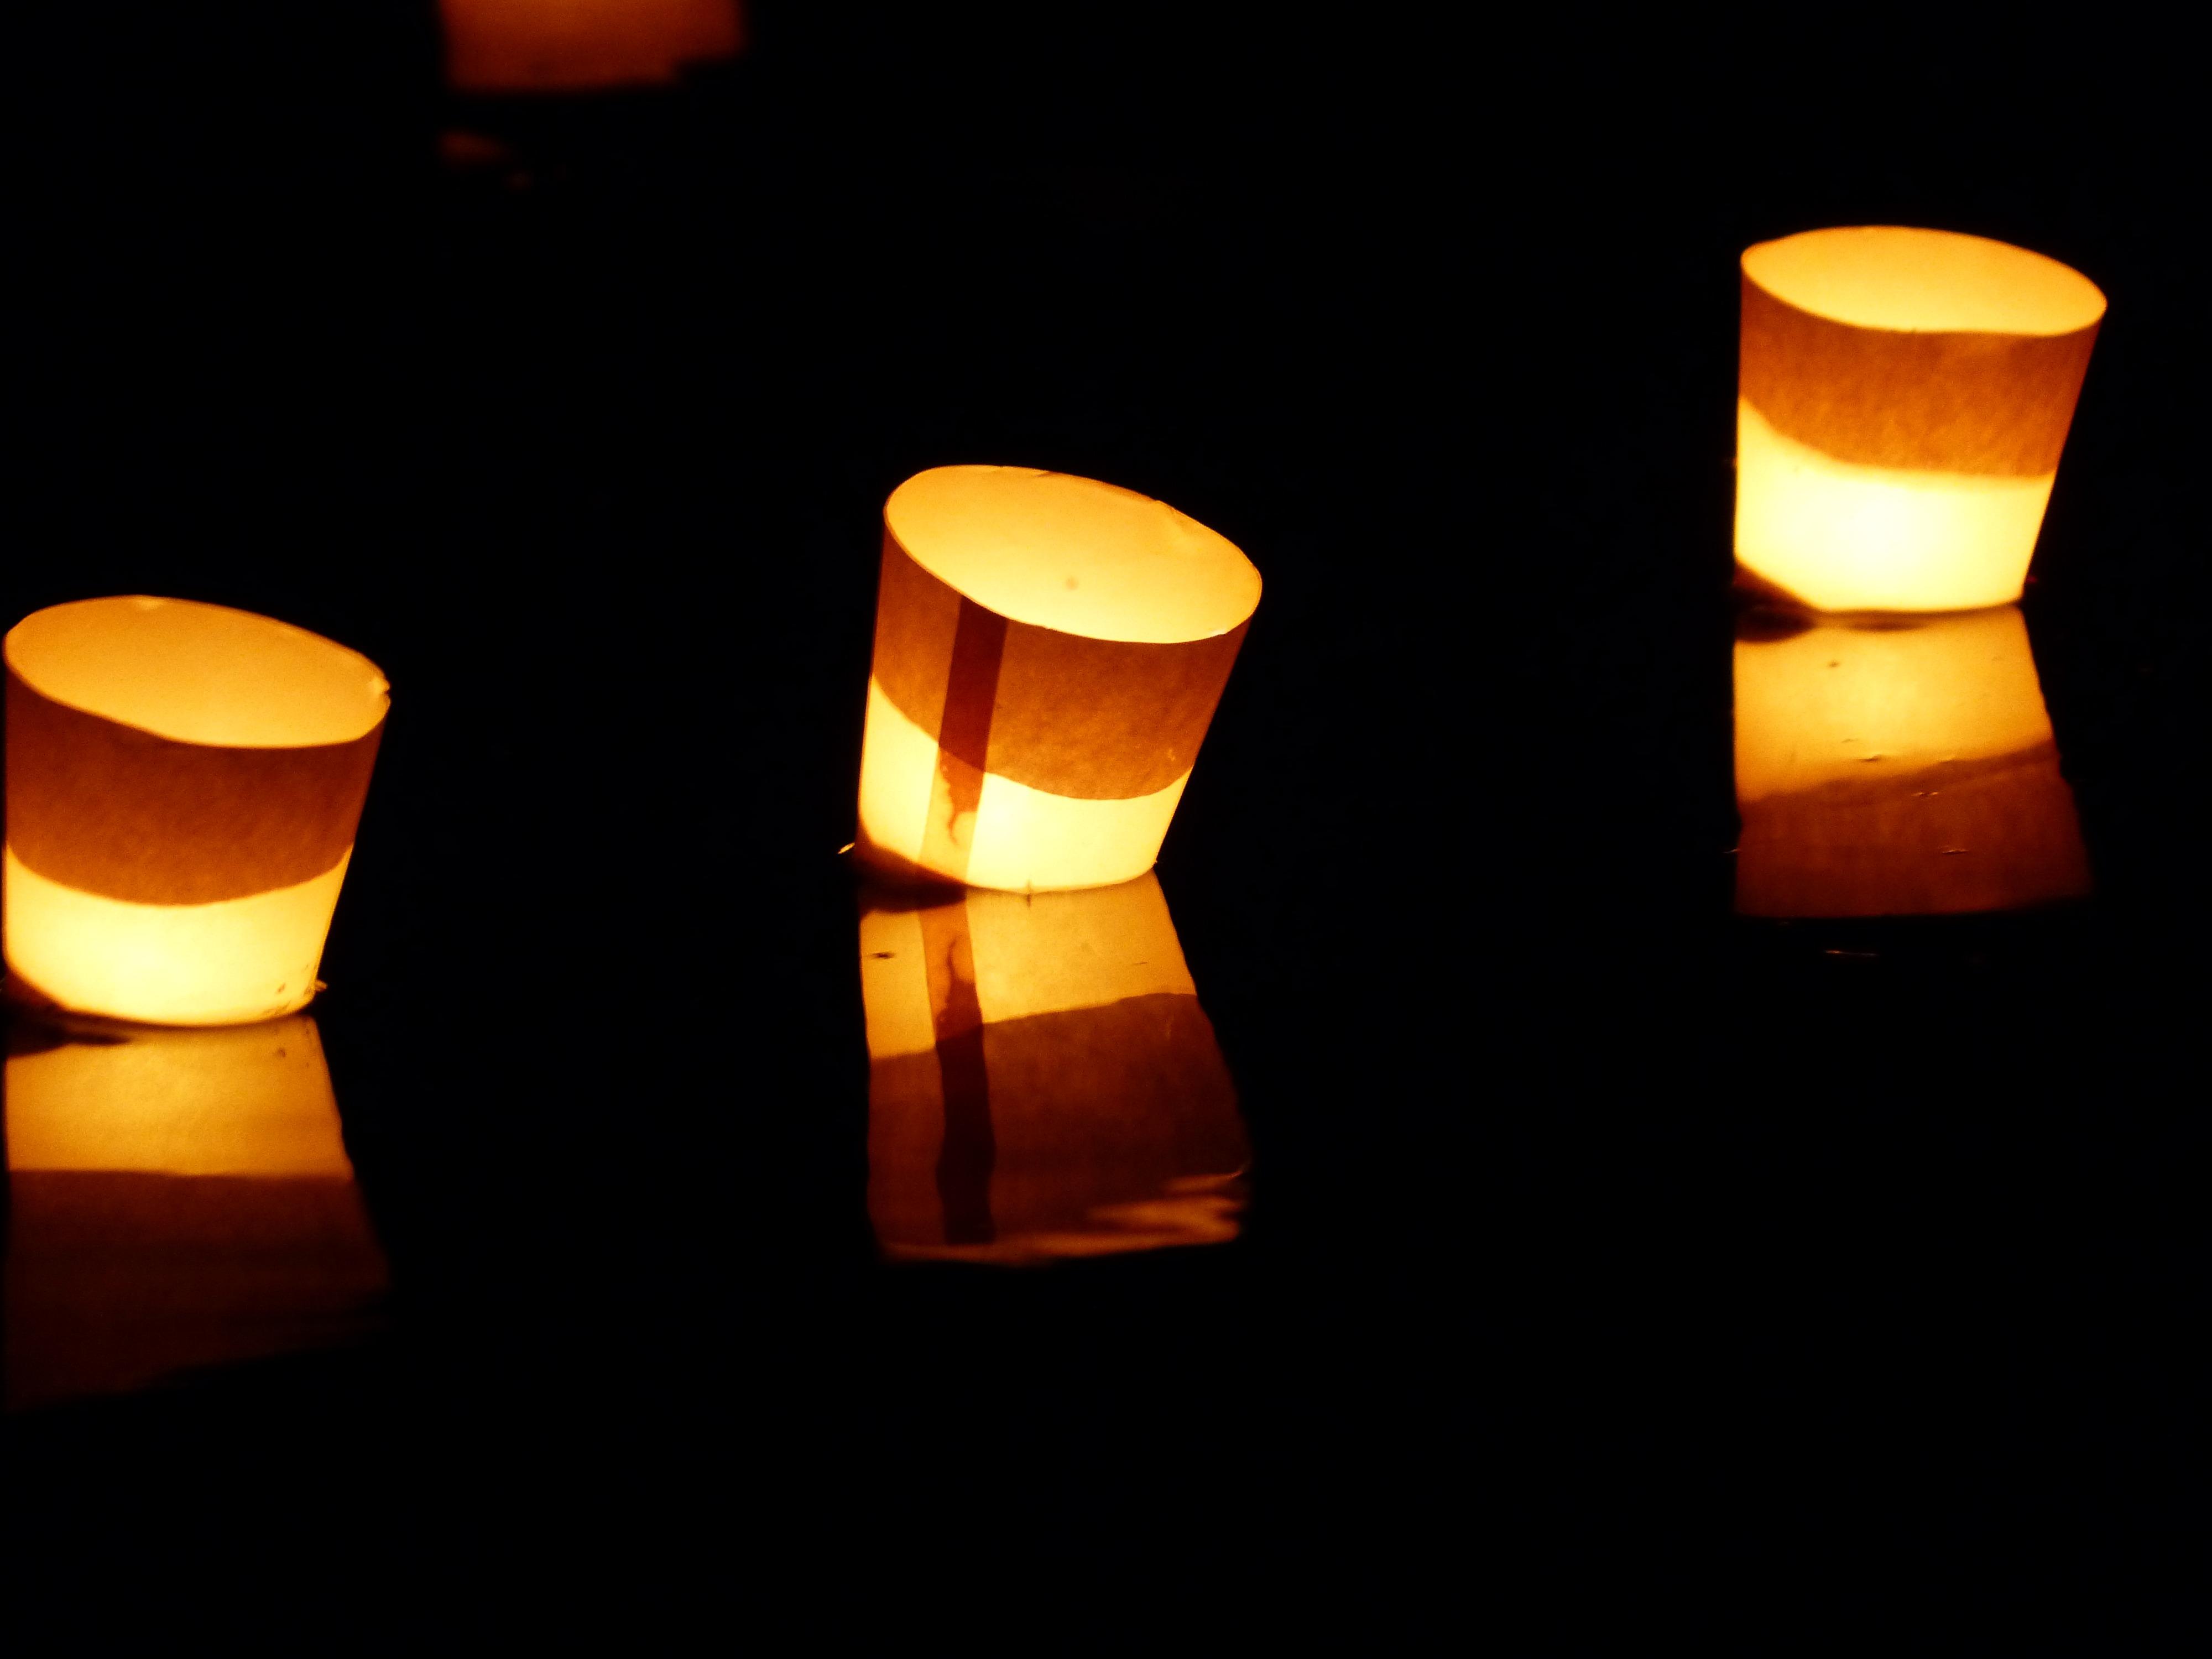 fotos gratis agua ligero noche atmsfera ro nadar amor color llama romance oscuridad amarillo iluminacin calor larga exposicin festival